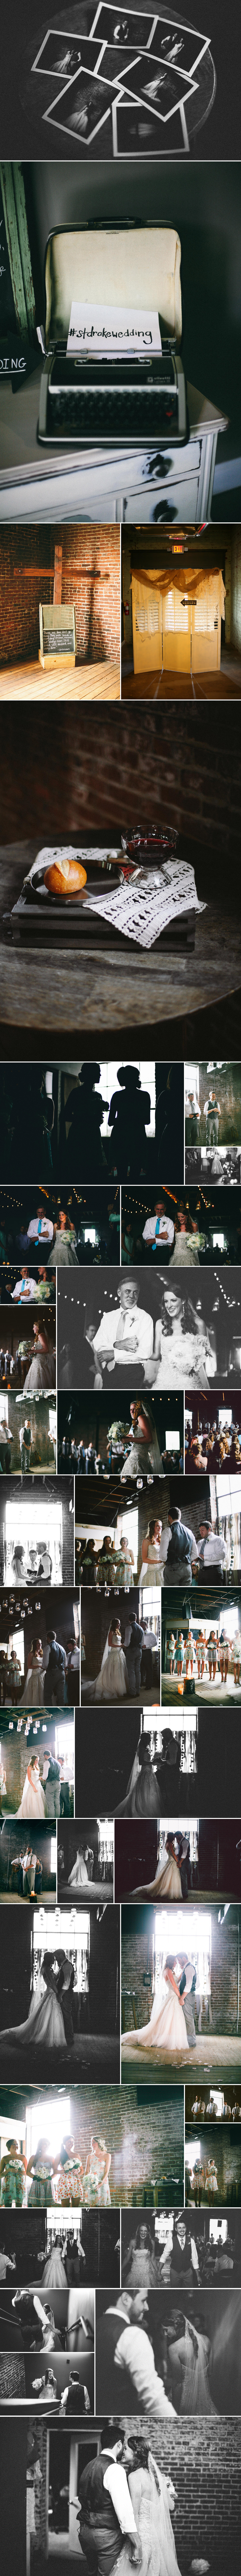 Blog-Collage-1378084416571.jpg